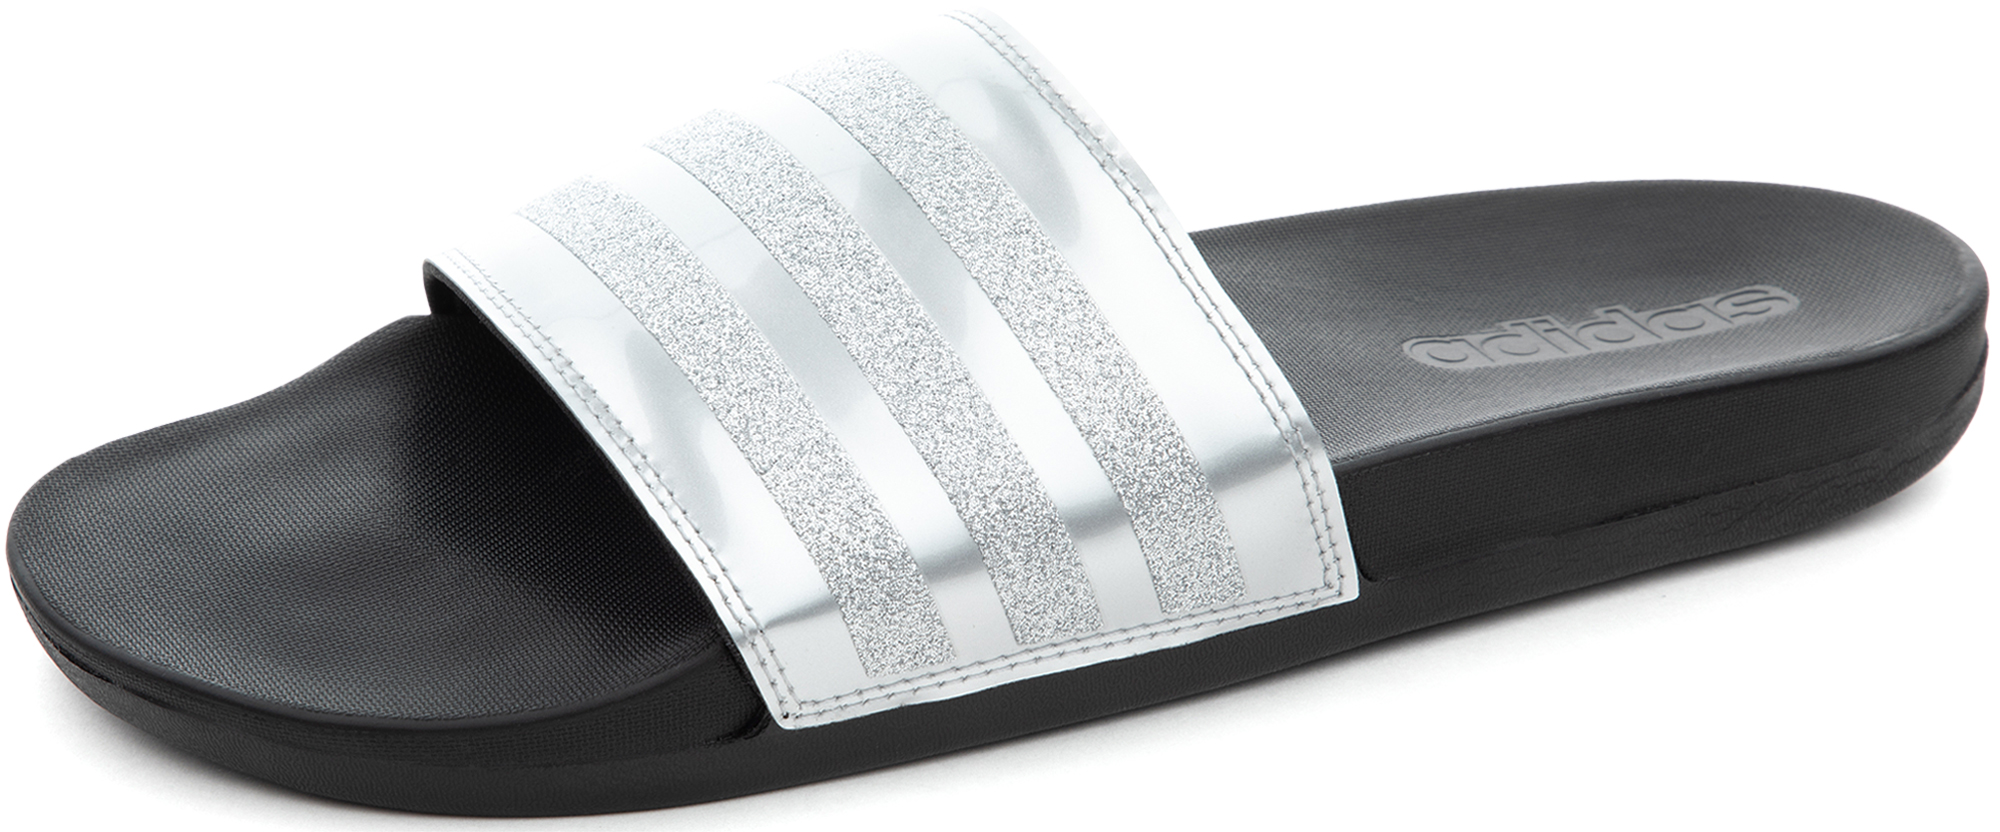 Adidas Шлепанцы женские Adidas Adilette Comfort, размер 38 шлепанцы женские rider цвет черный розовый 82611 22295 размер 39 38